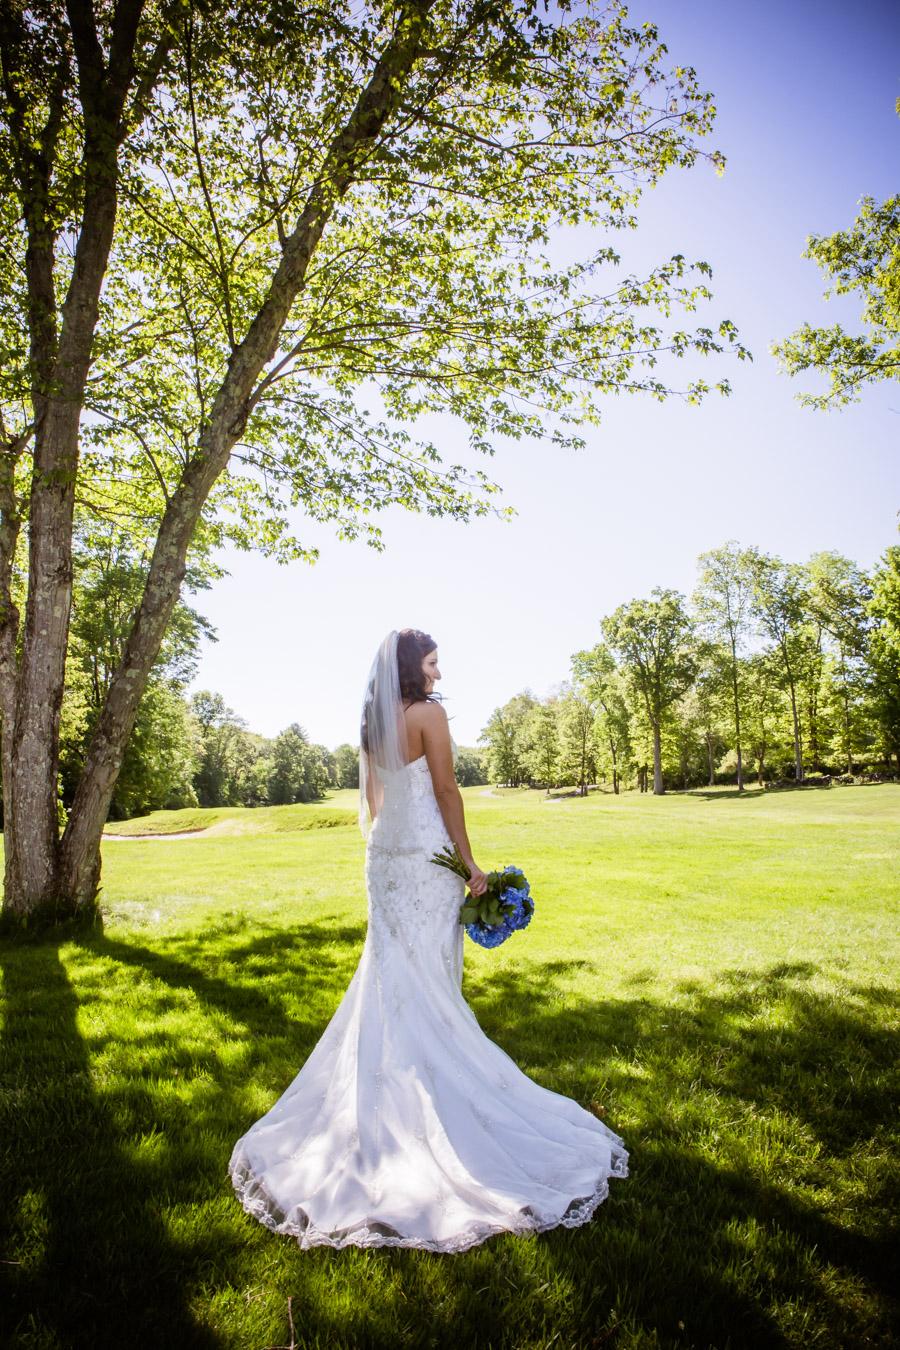 NEPA_Pocono_Weddings_Rob_Lettieri_Photography_07.jpg